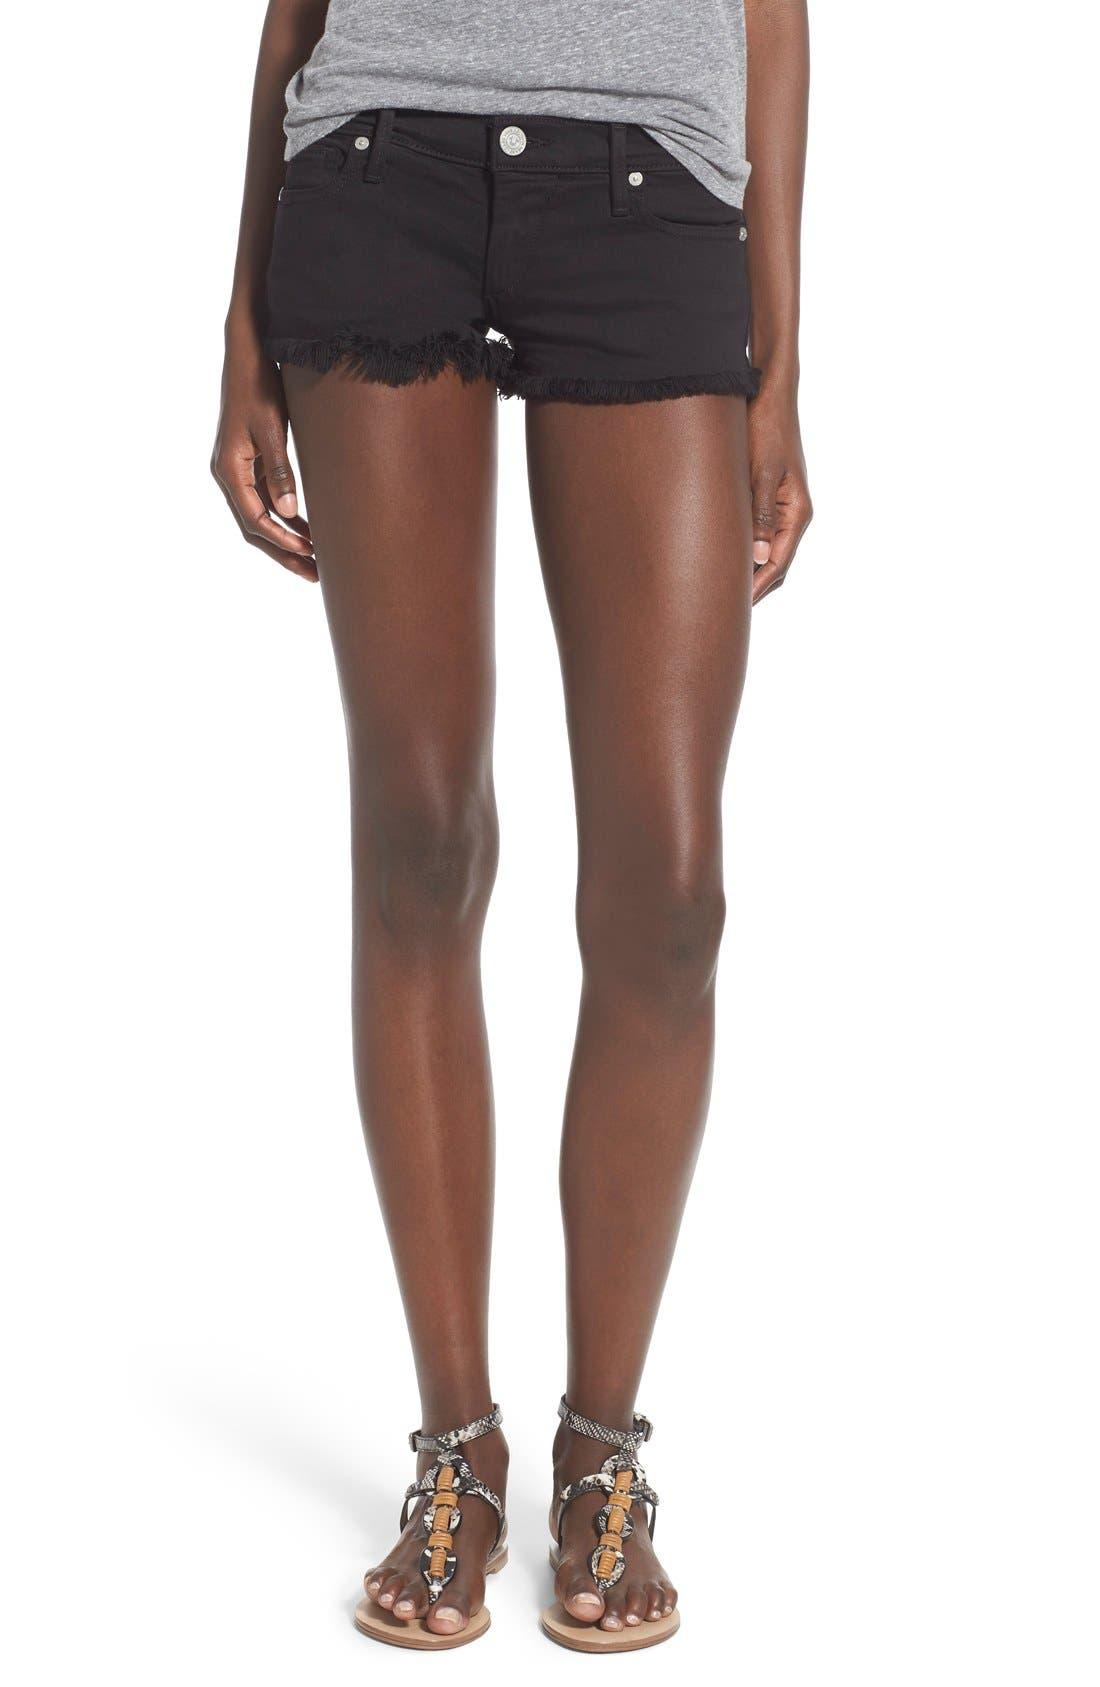 Alternate Image 1 Selected - True Religion Brand Jeans Joey Flap Pocket Cutoff Denim Shorts (Jet Black)